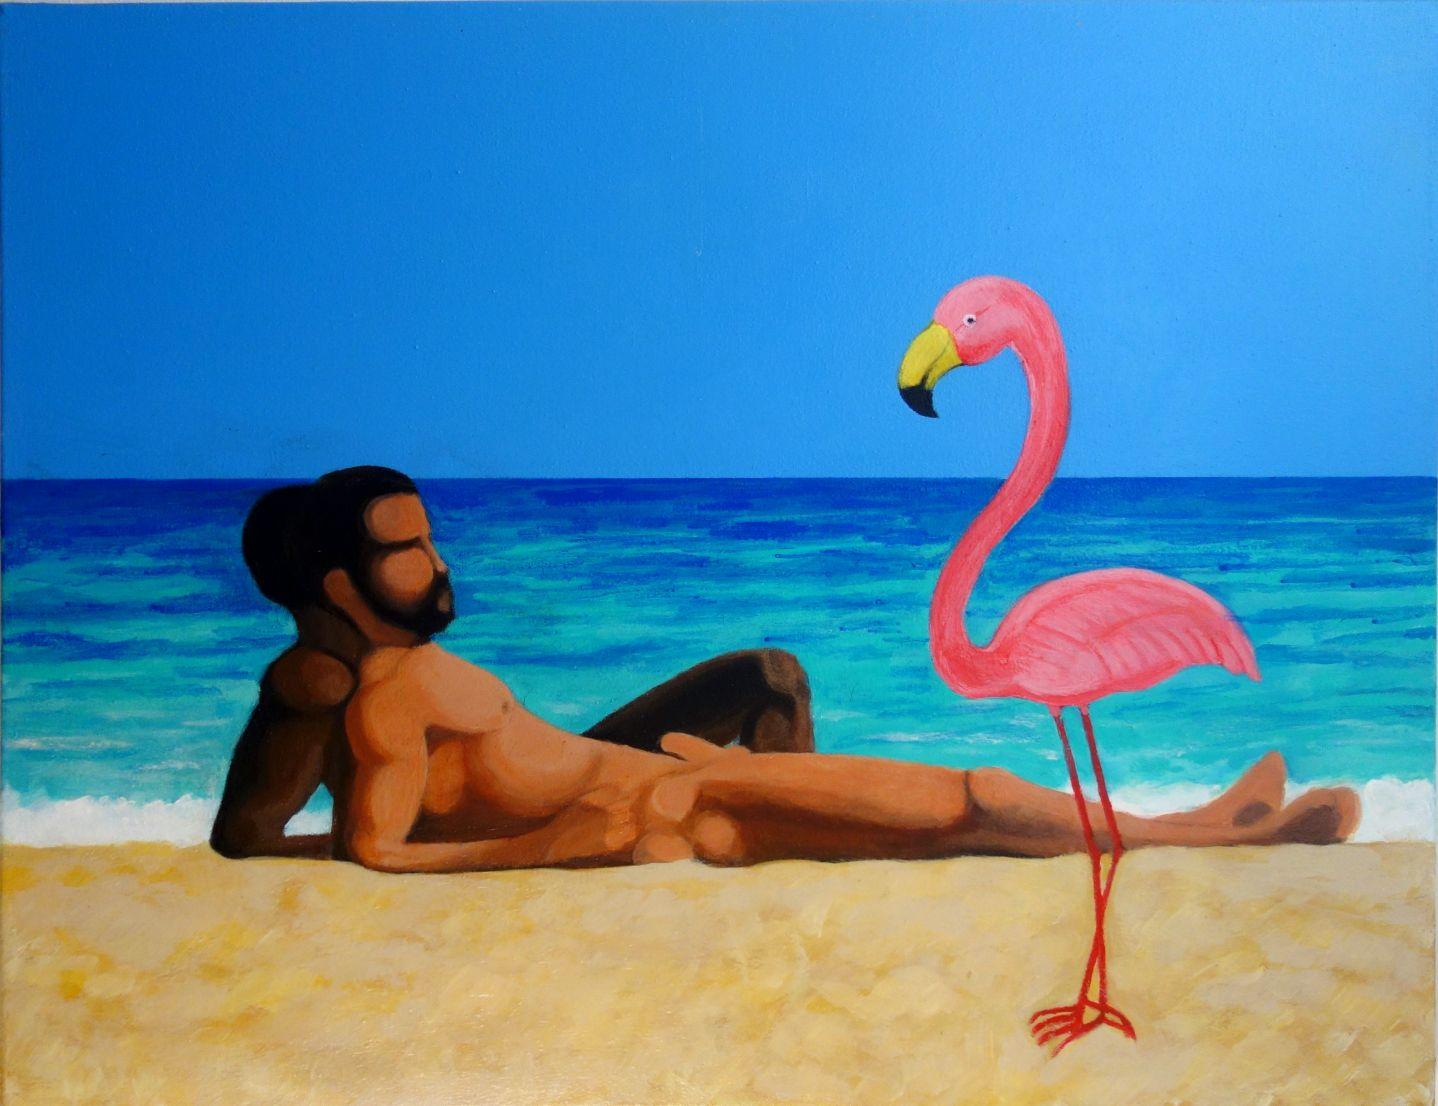 Interracial couple at the beach with a plastic flamingo (2019) - Jose Gomez Navarro